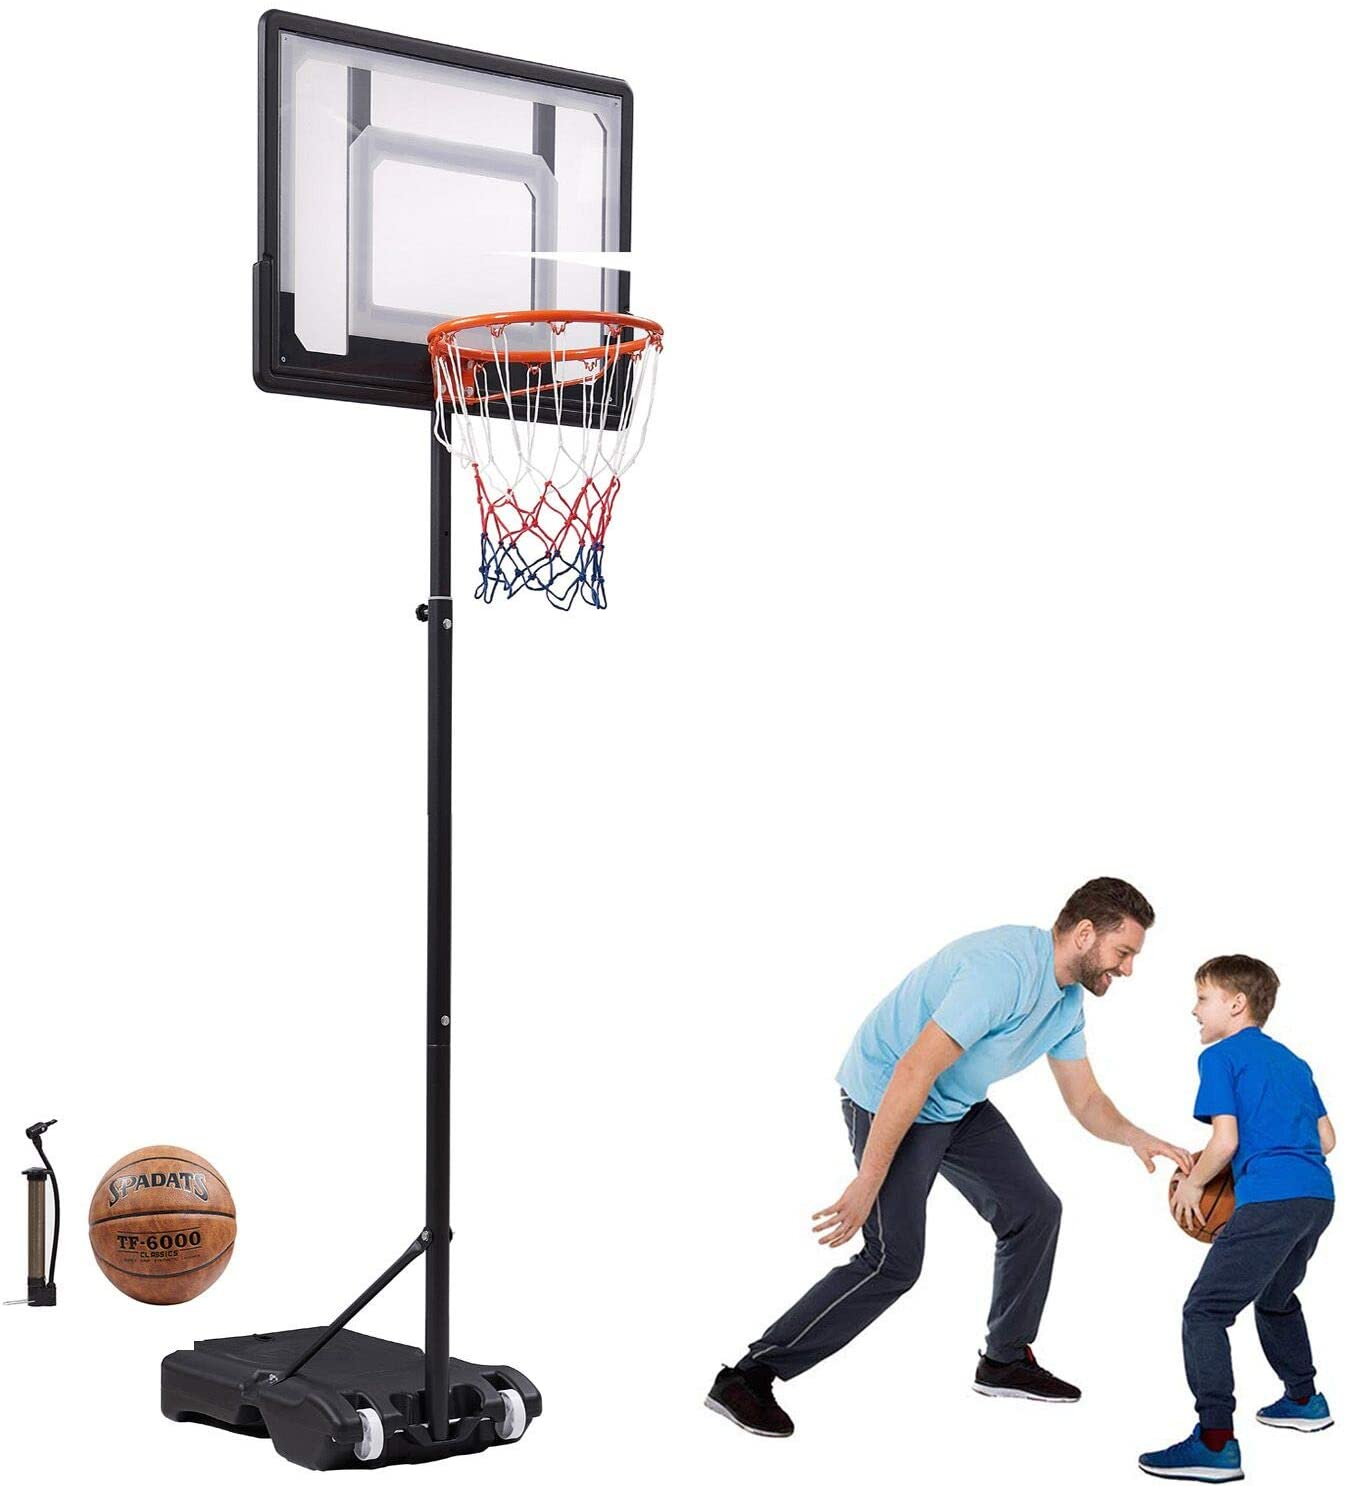 Bodywell Basketball Hoop & Goal Basketball System